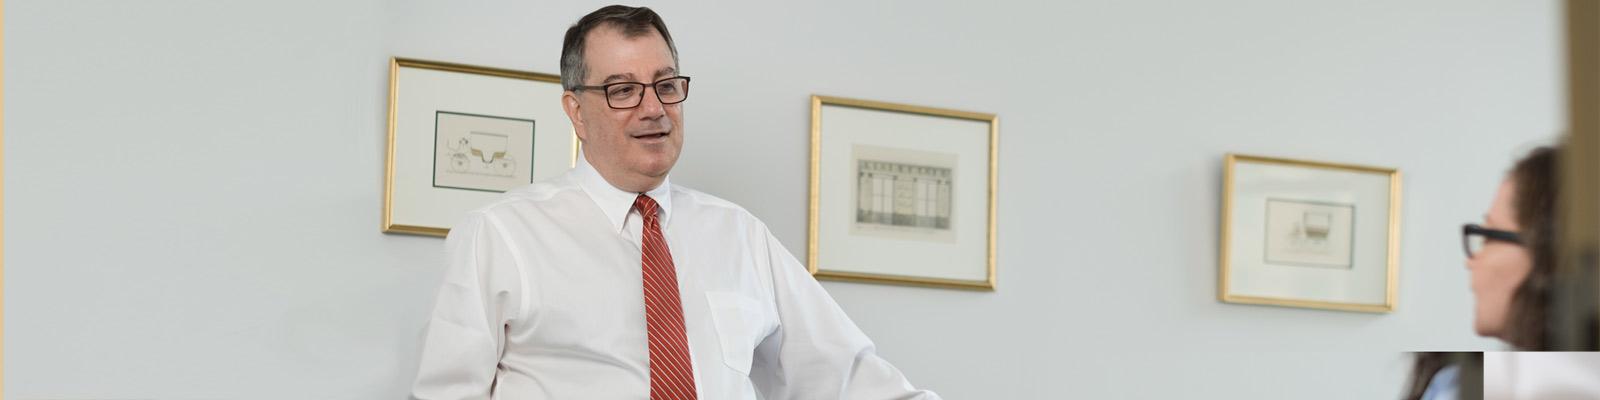 Douglas-F.-Wasser Real Estate Attorney-in-Office